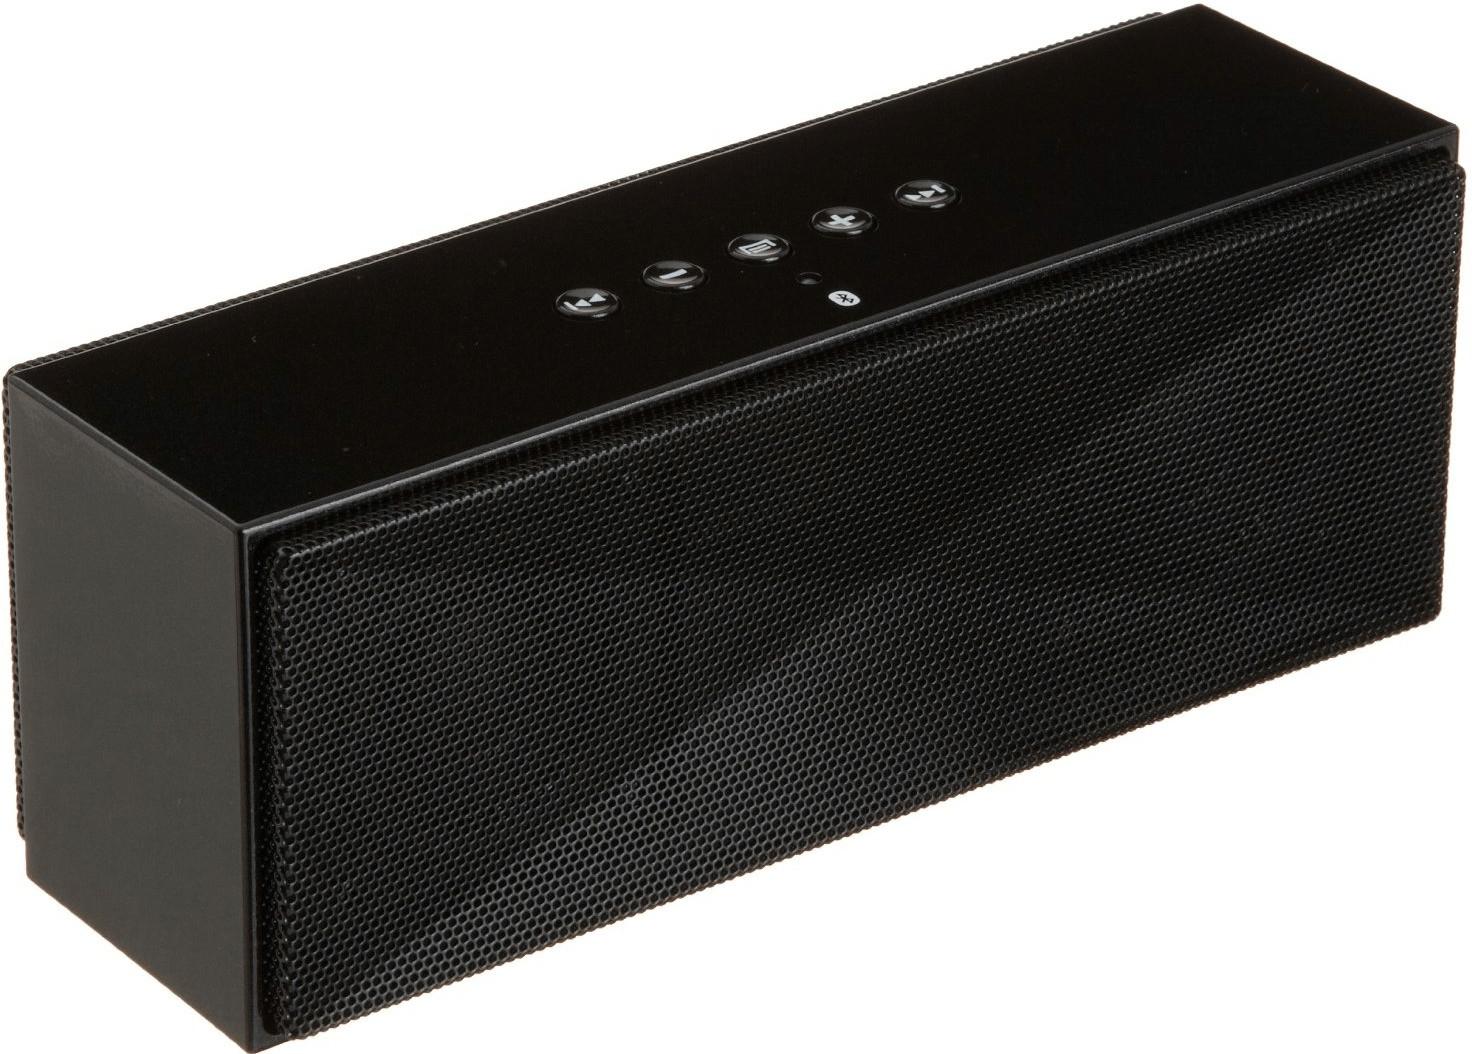 AmazonBasics Tragbarer Bluetooth Lautsprecher